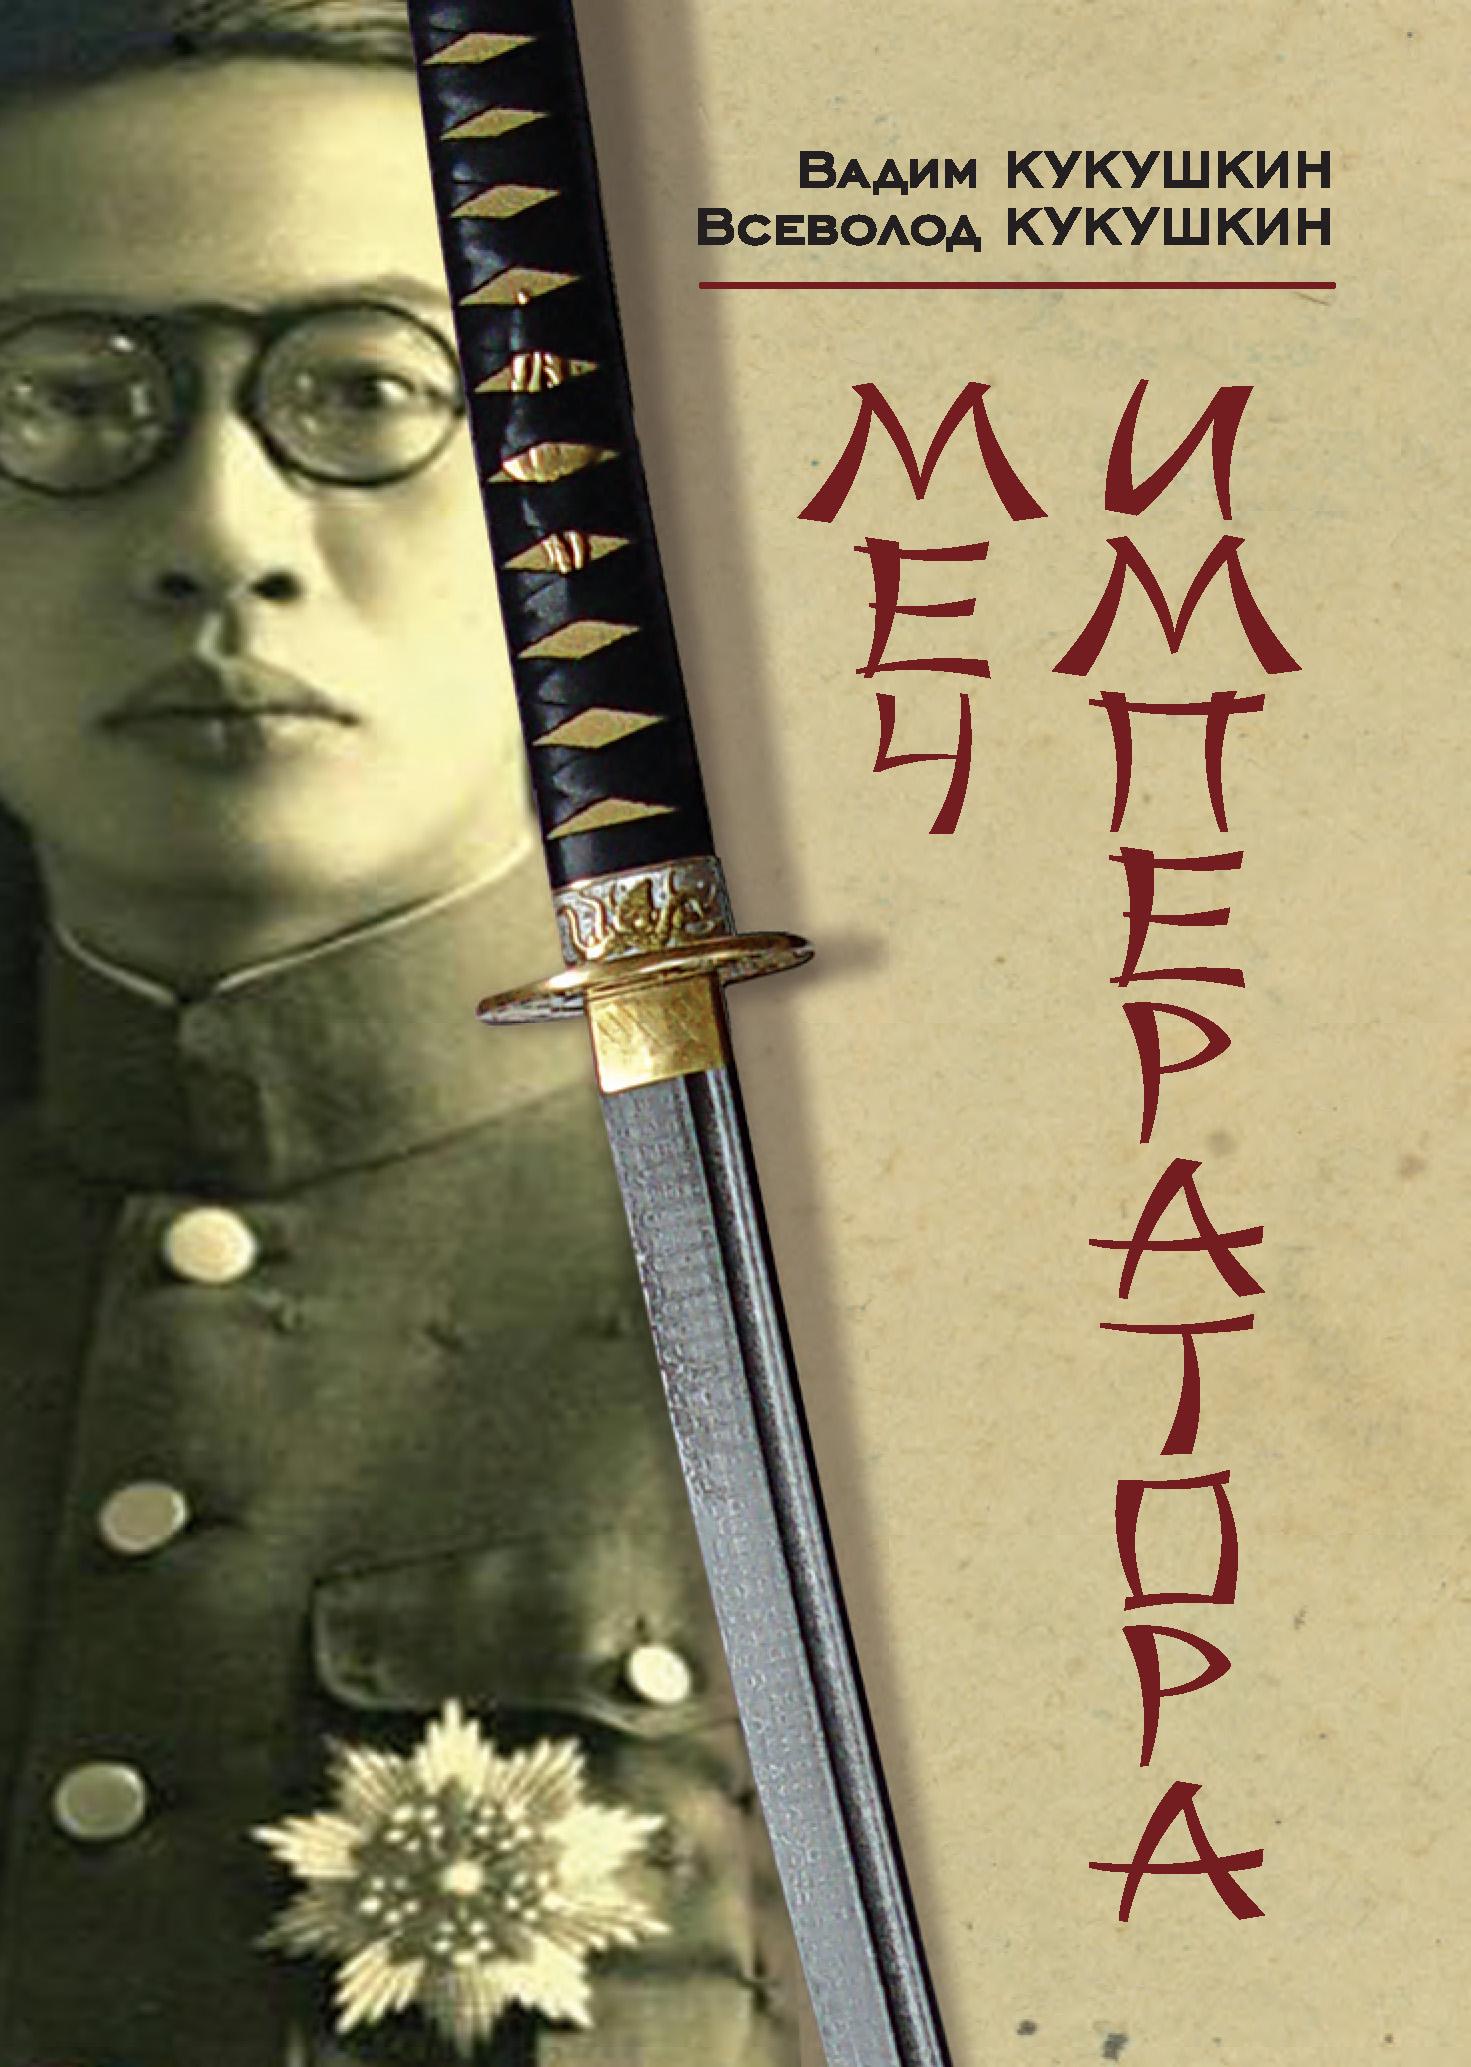 Всеволод Кукушкин Меч императора кукушкин всеволод кукушкин вадим меч императора